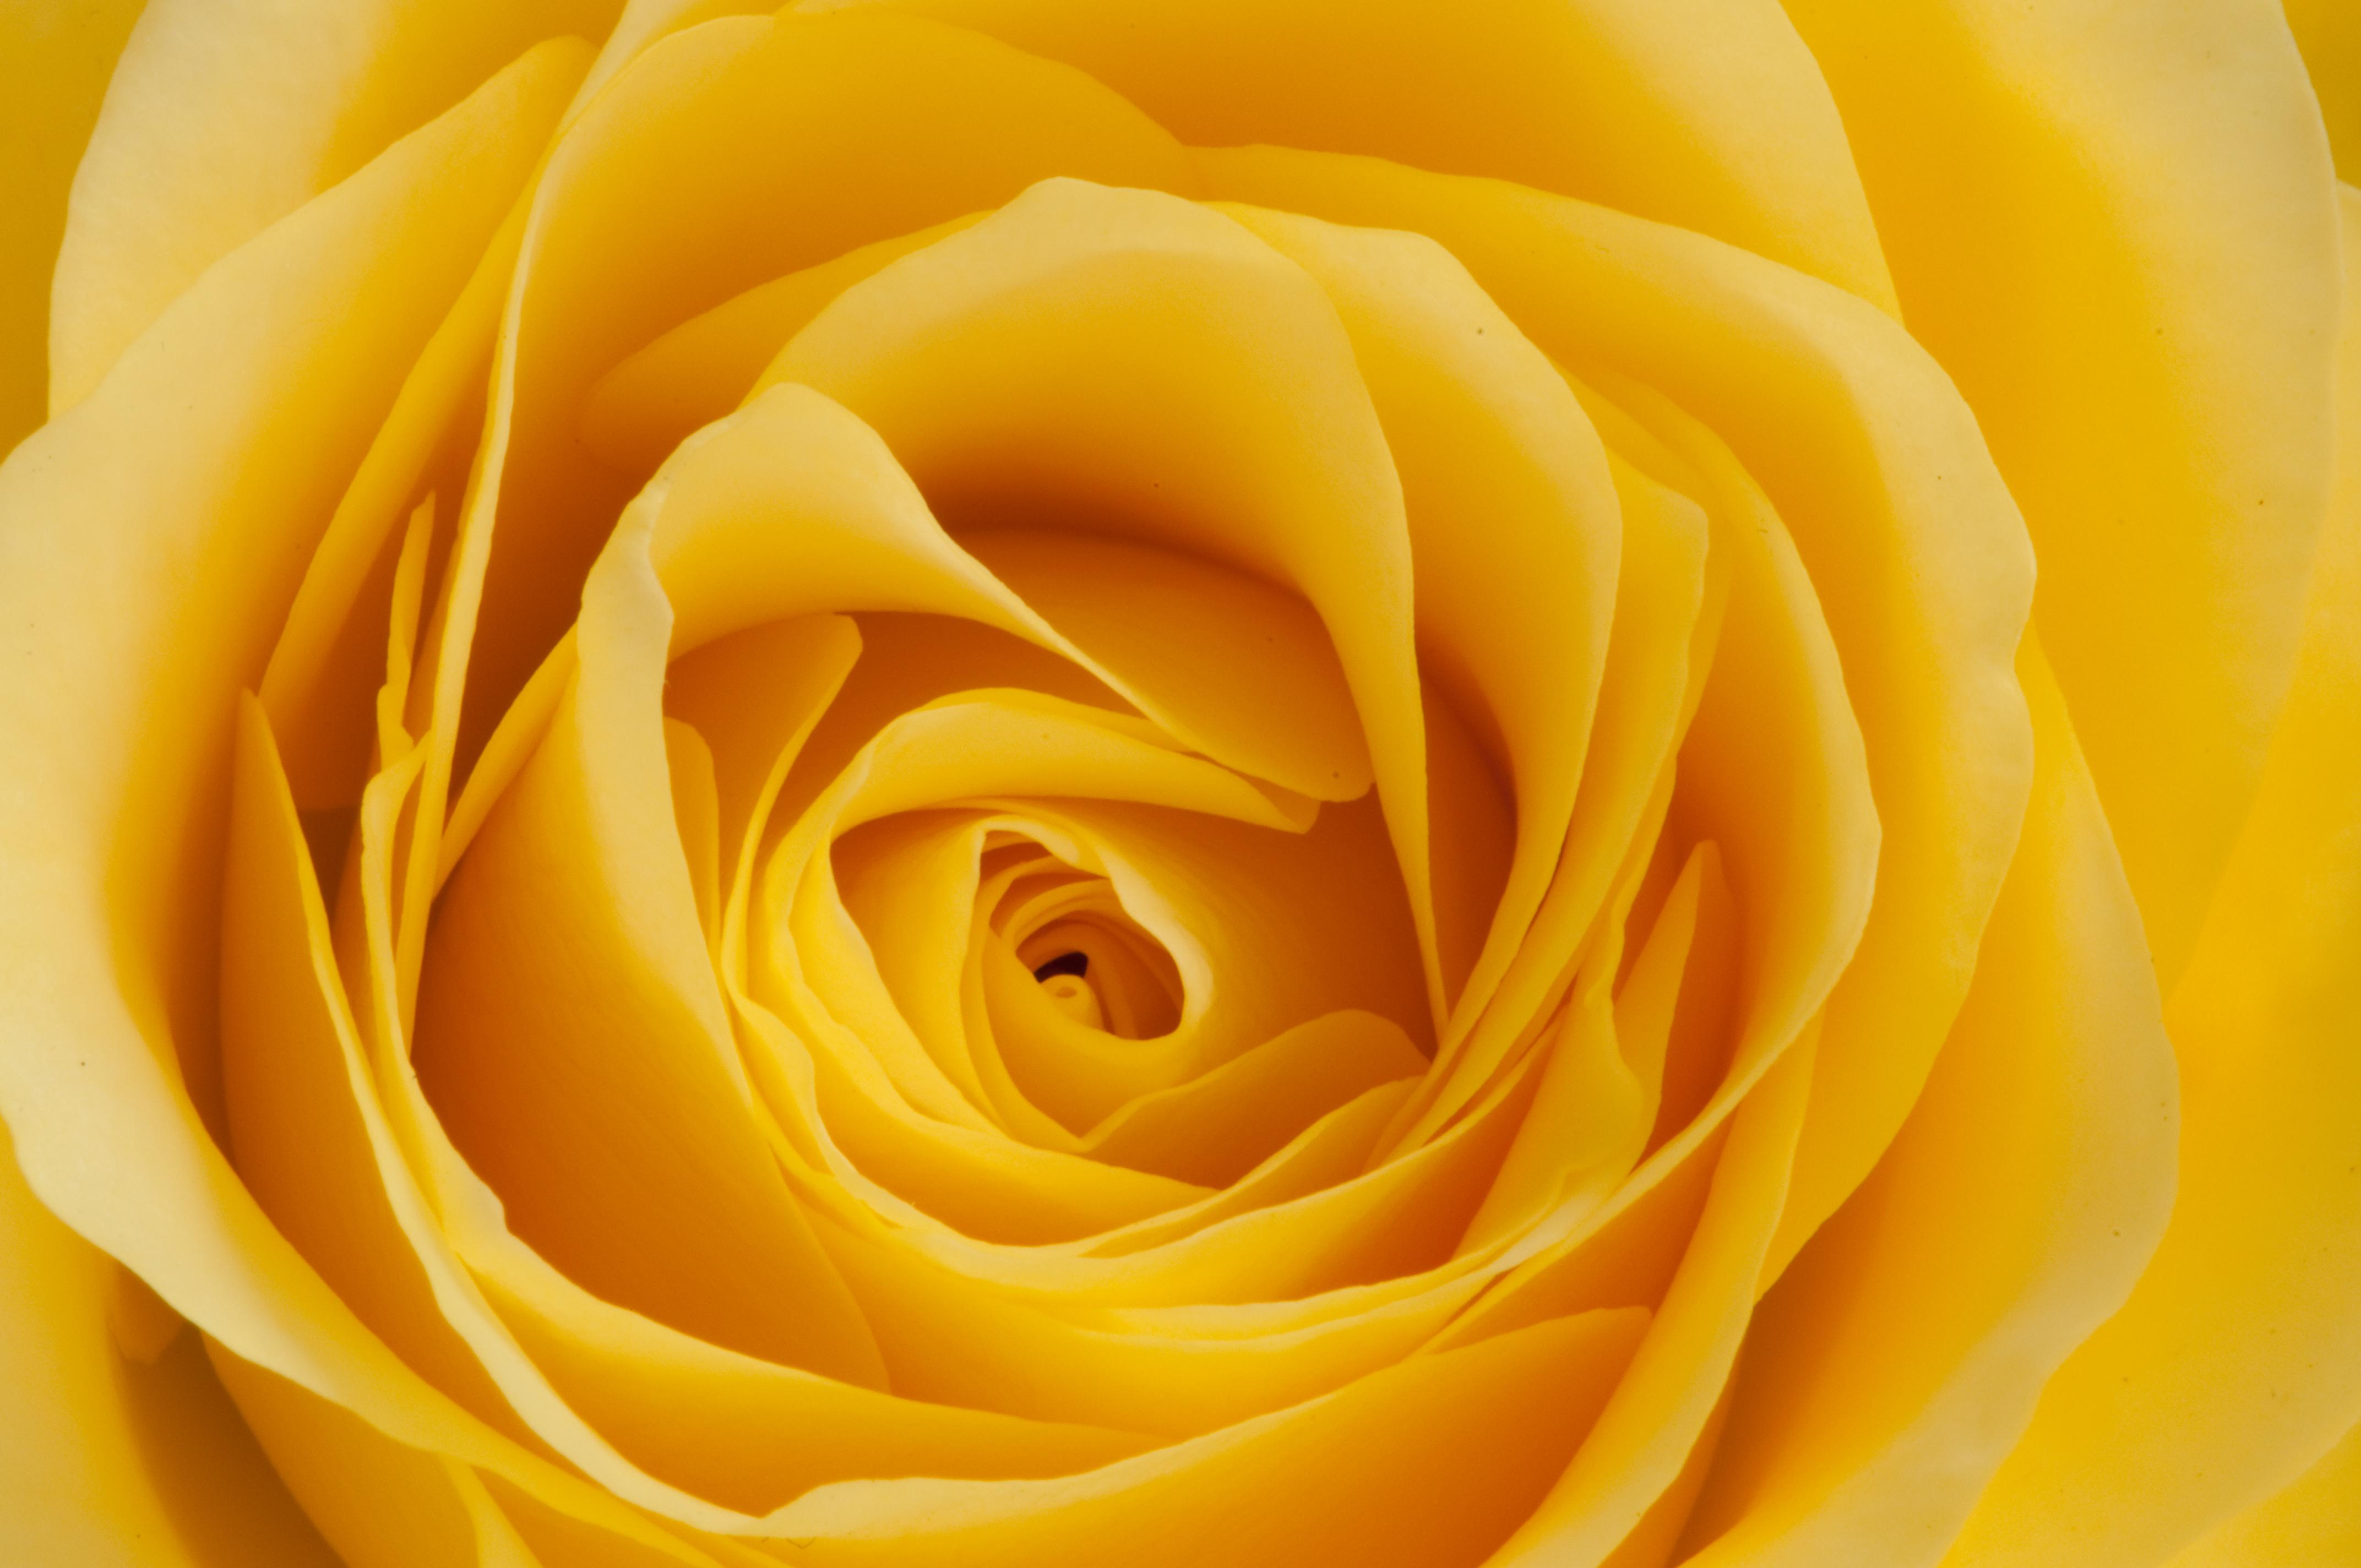 Download mobile wallpaper Flowers, Macro, Rose Flower, Rose, Petals, Bud for free.